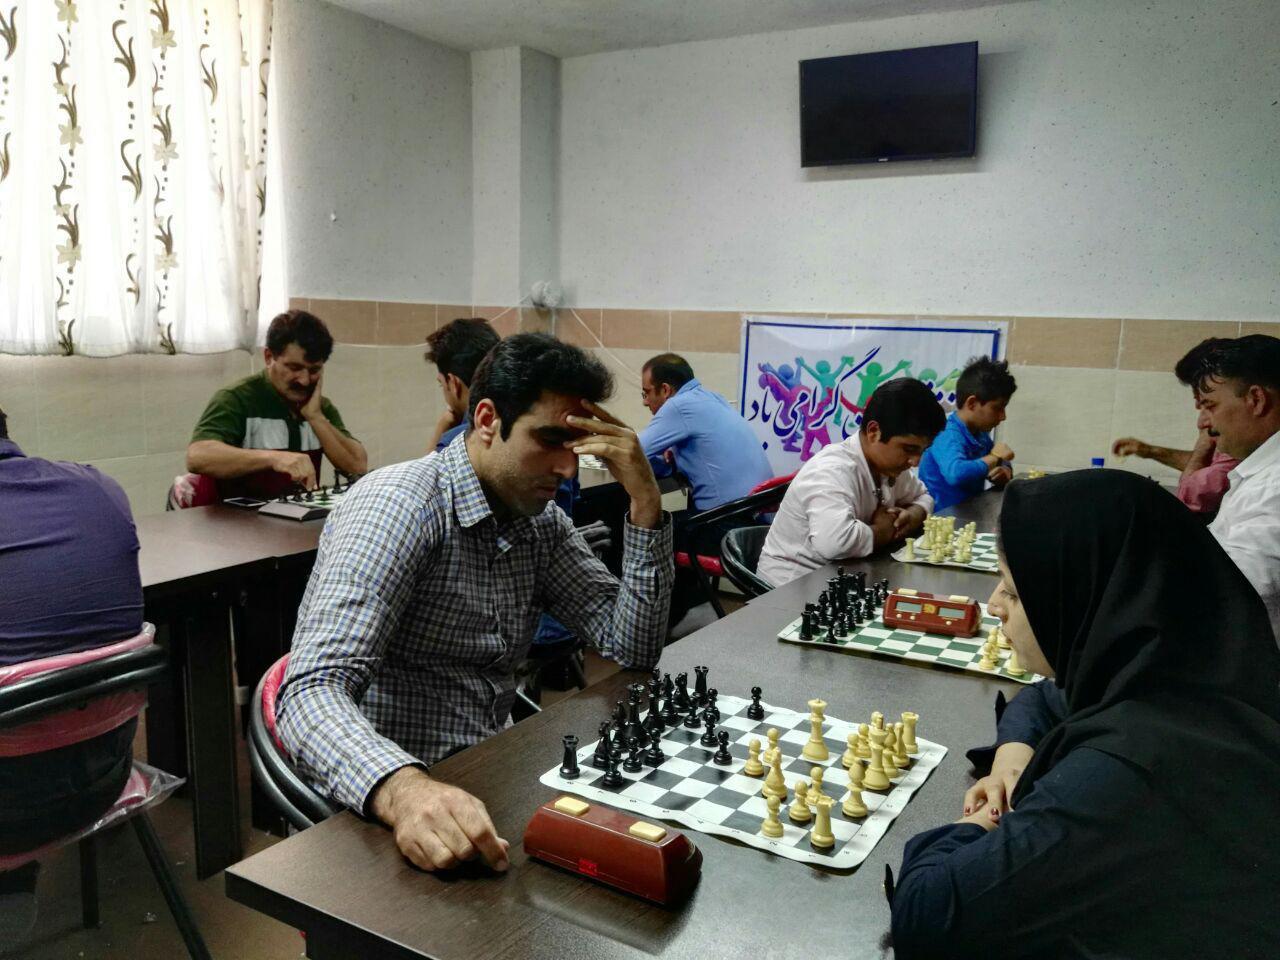 photo_2017-09-07_07-40-39 جام شطرنج تعاونگران فراشبند با قهرمانی چراغی به پایان رسید